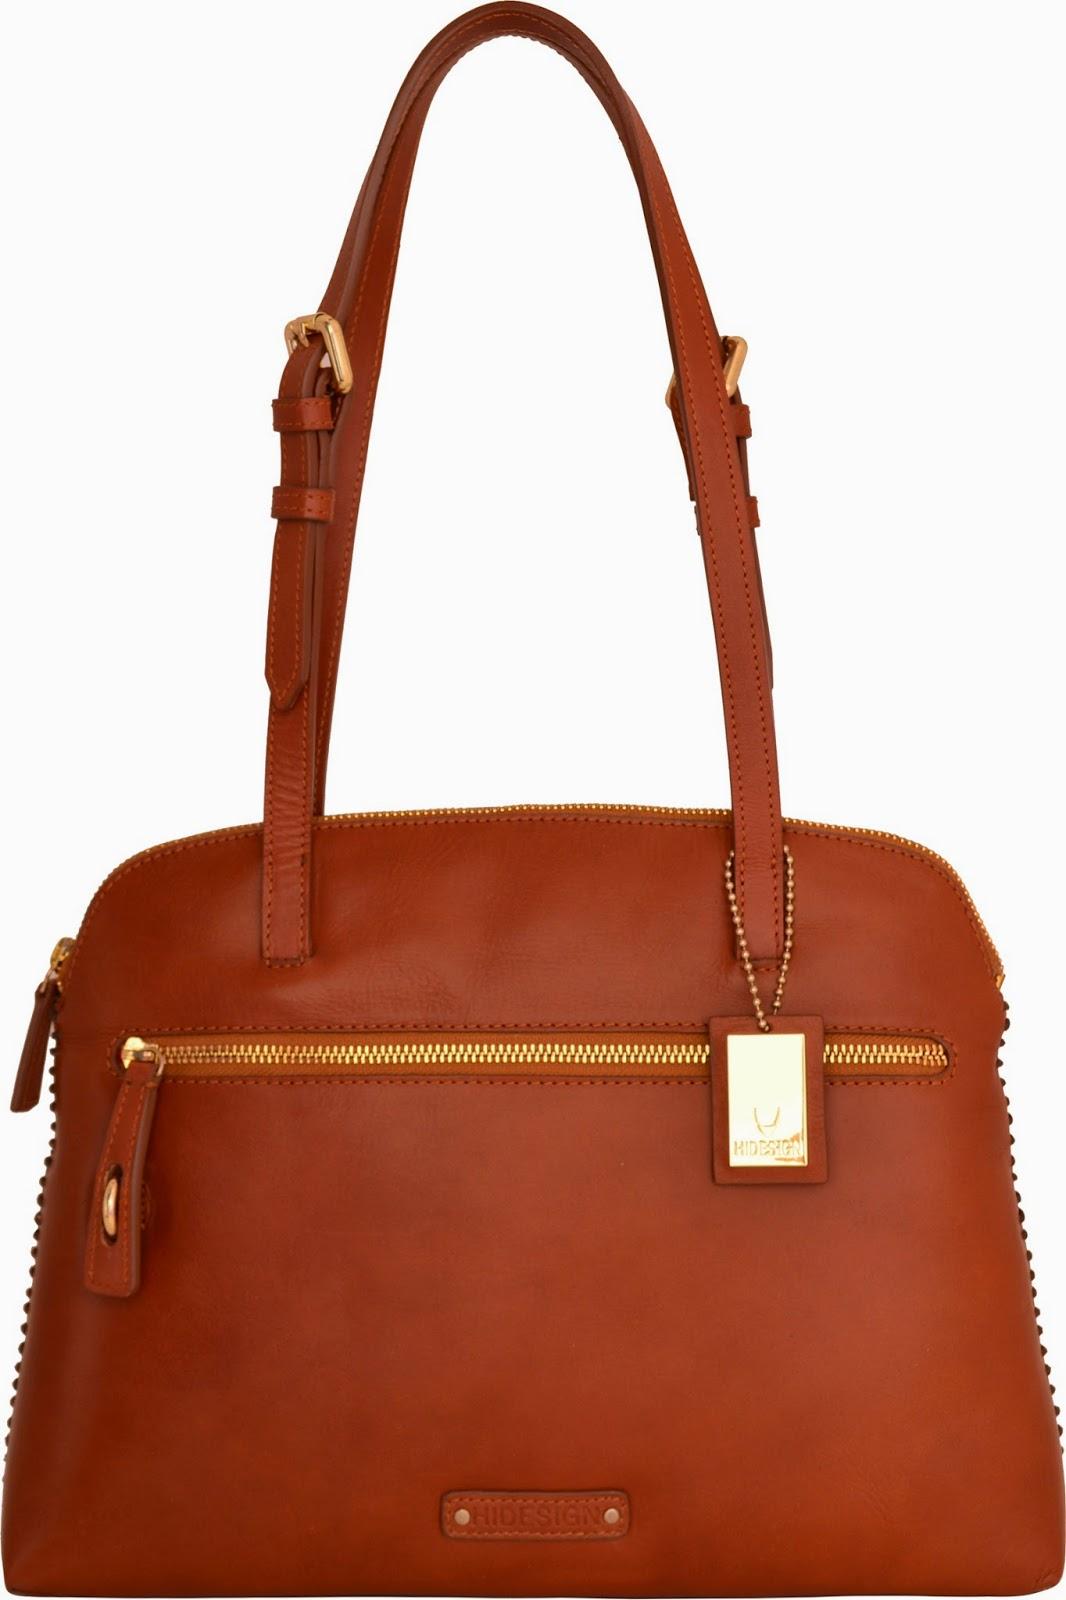 Hidesign Classic handbag